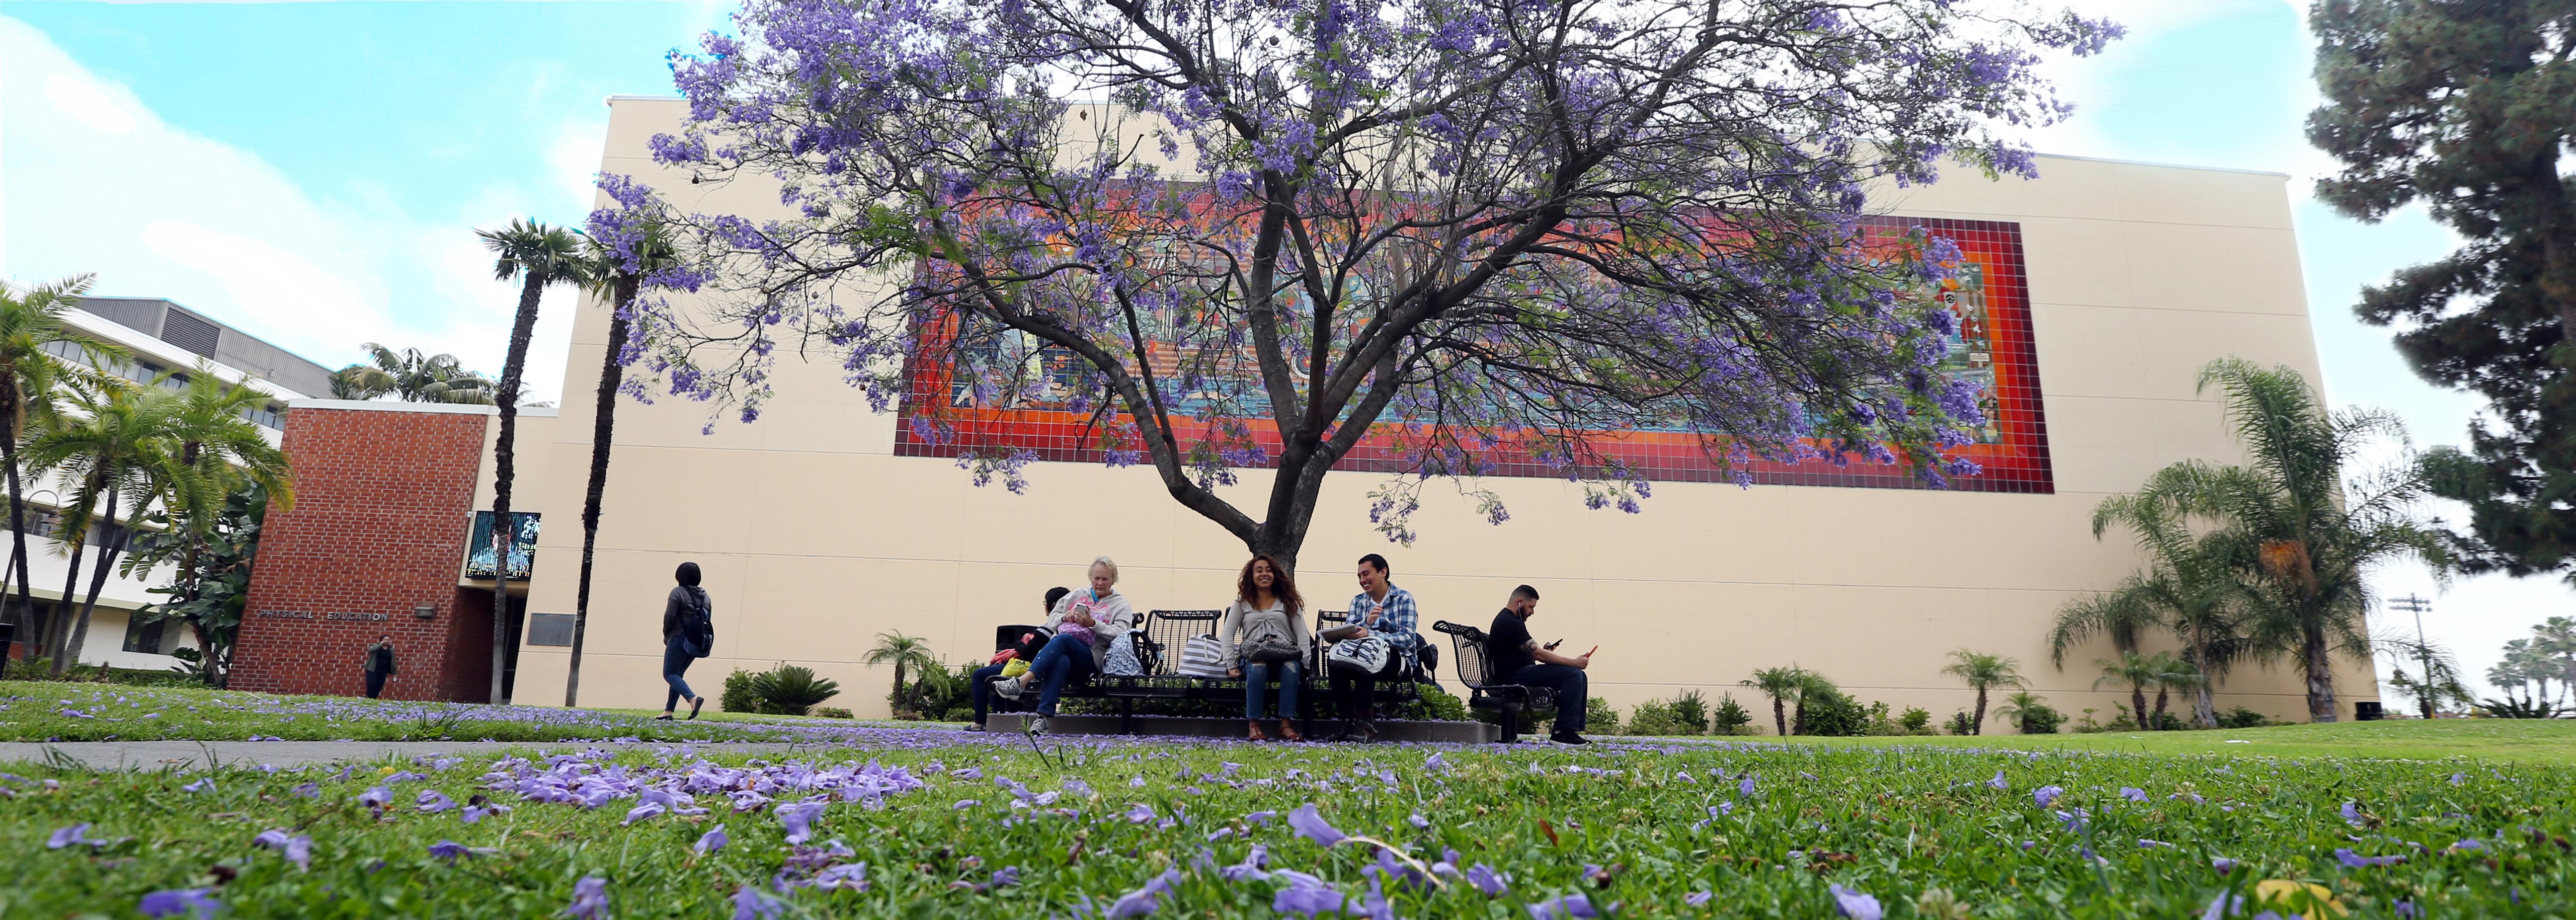 photo of jacaranda tree